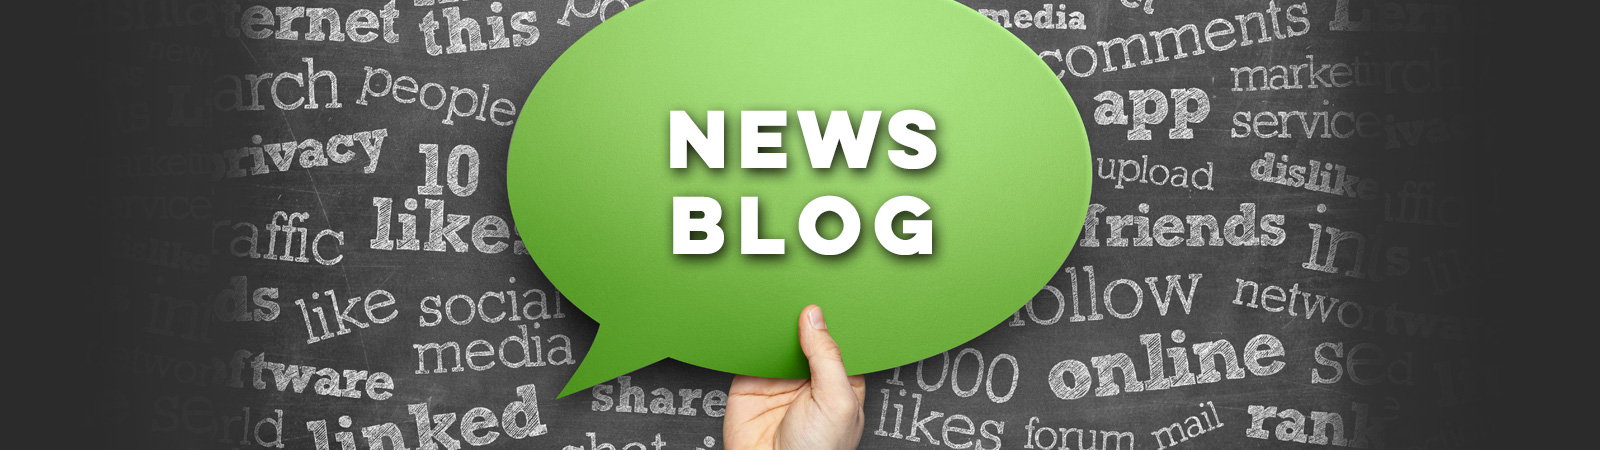 blog-1600x450